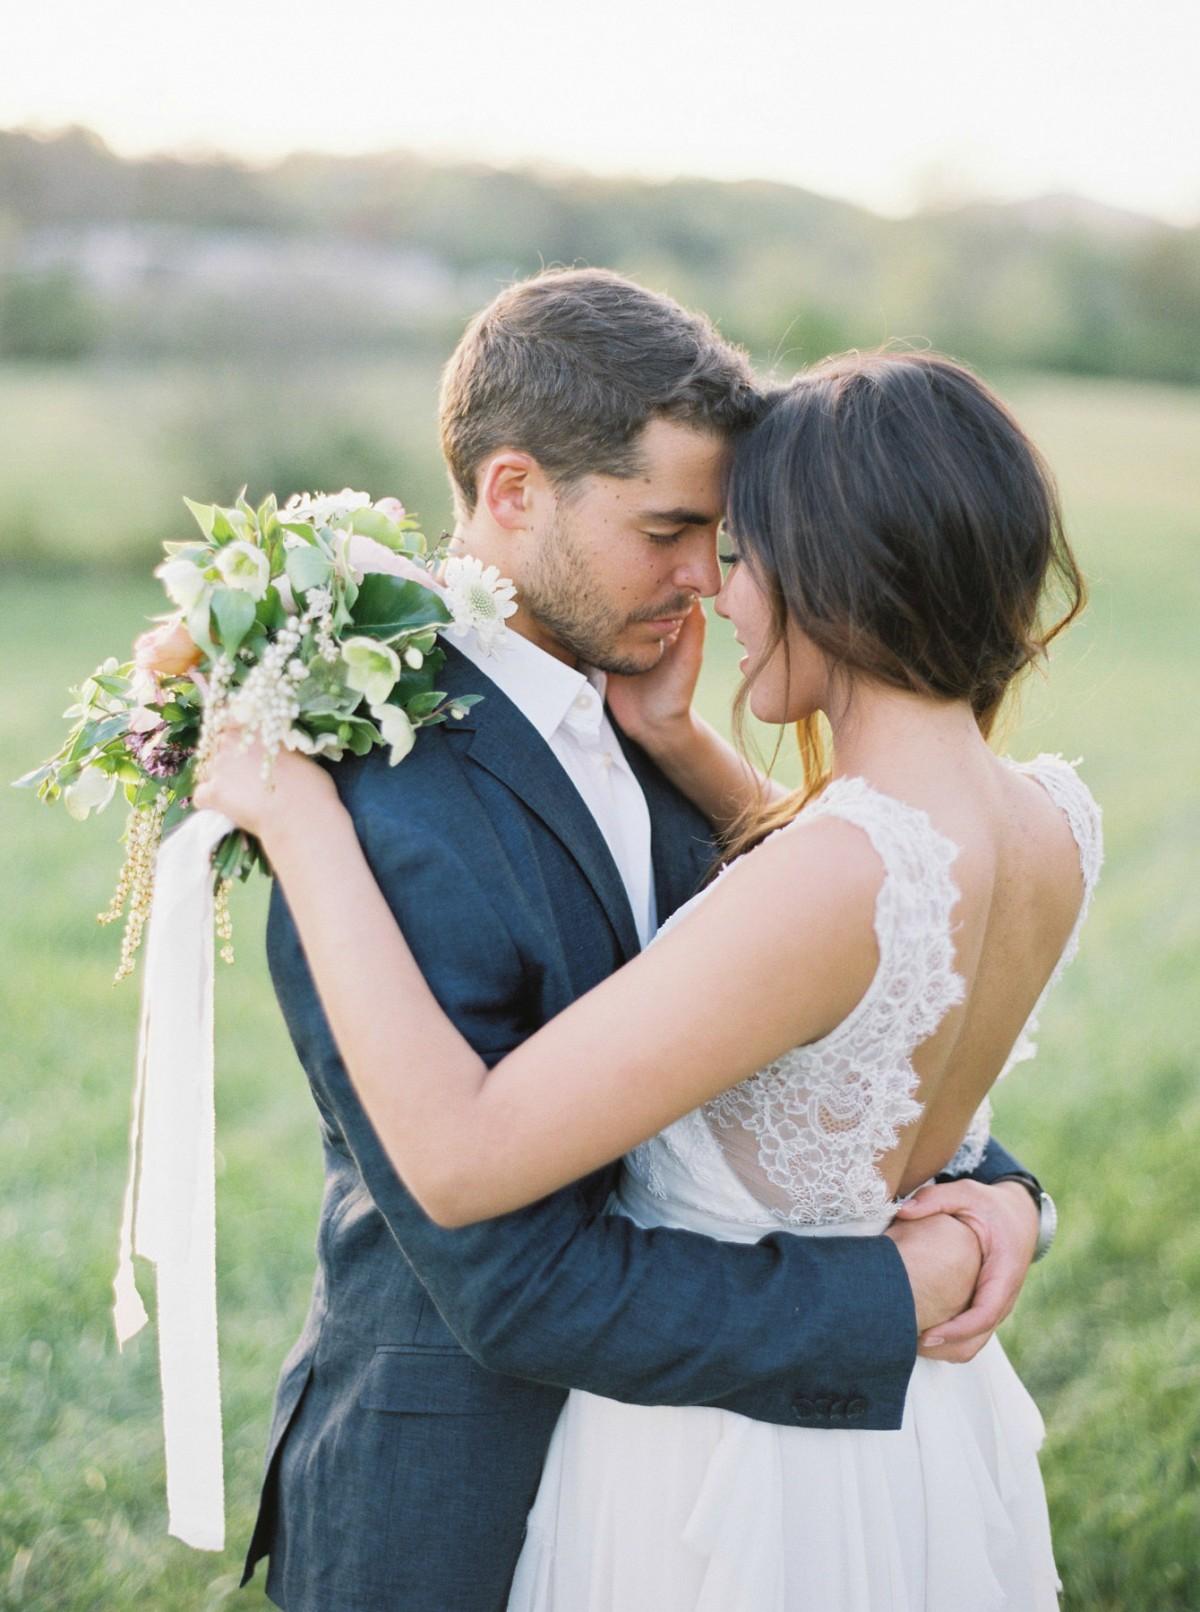 Natural, organic bride and groom portraits by Sawyer Baird | Wedding Sparrow | wedding blog